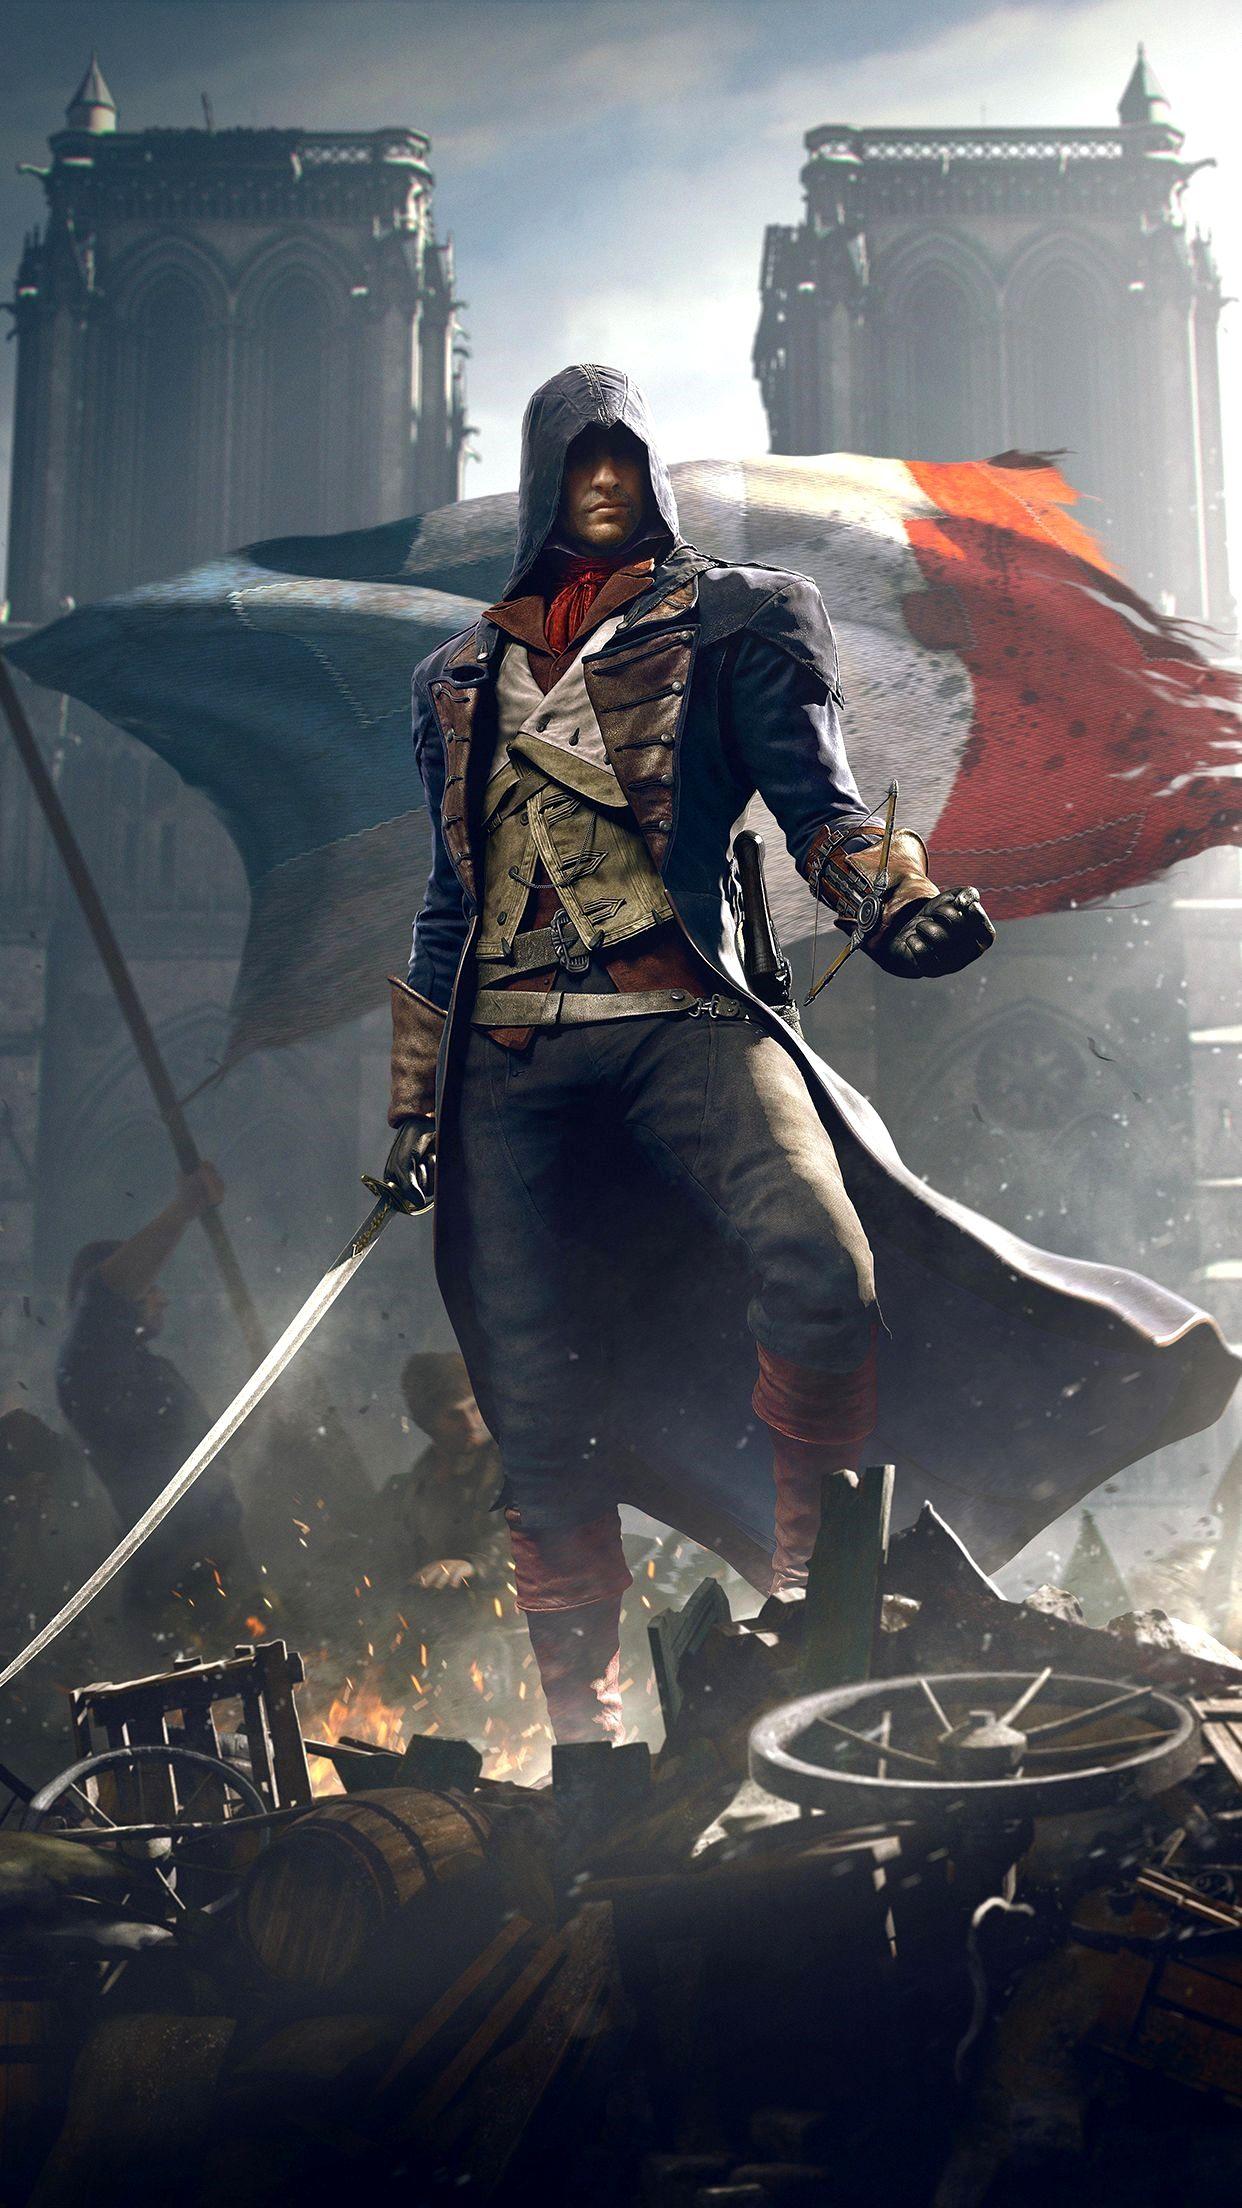 Assassin's Creed Wallpaper Phone 4K Gallery Check more at